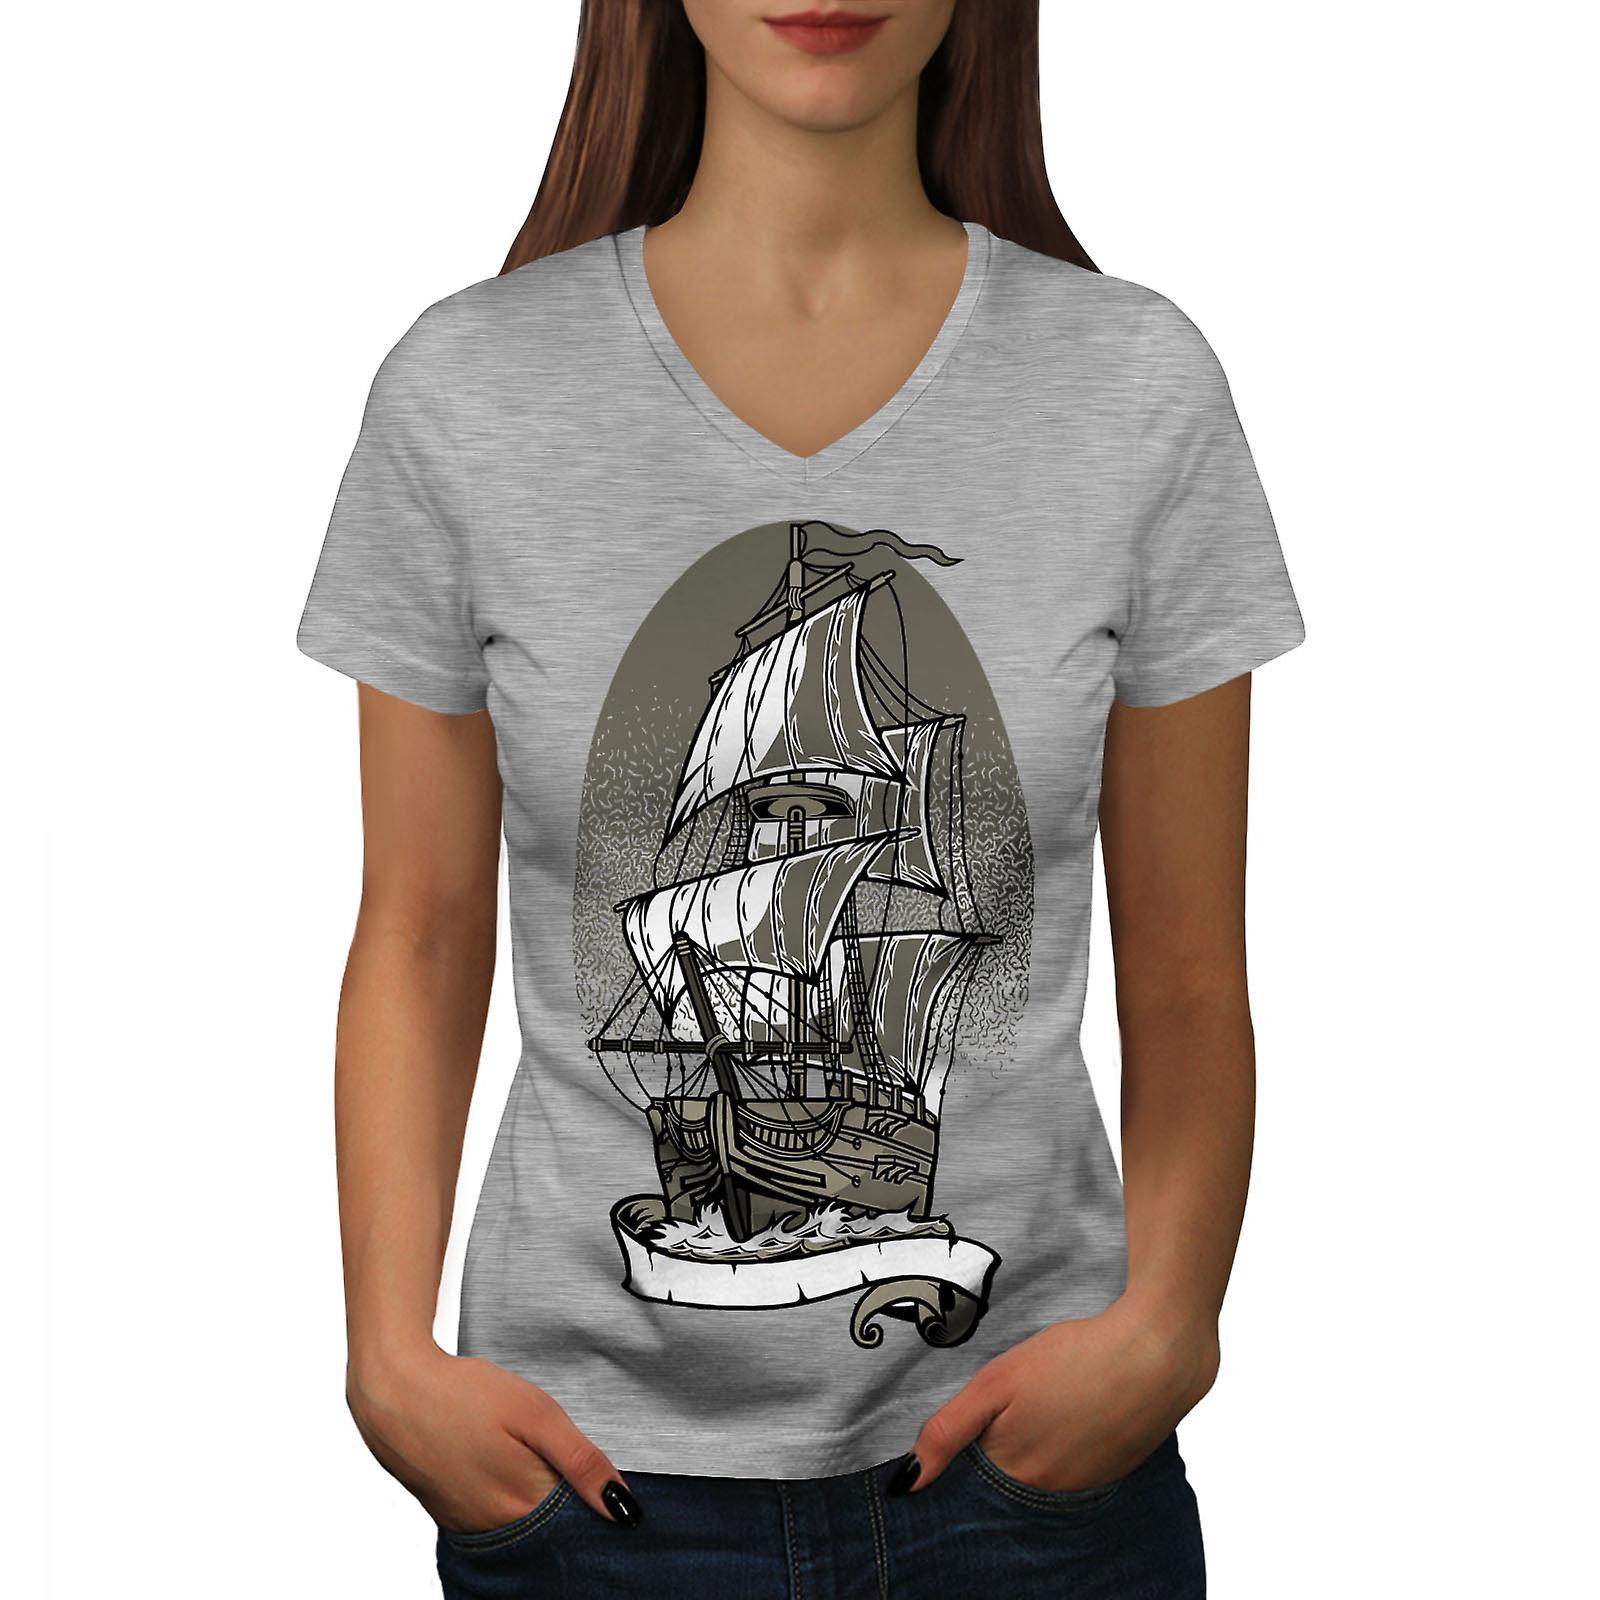 Navire ancien voile mer fantastique femmes GreyV-Neck T-shirt   Wellcoda